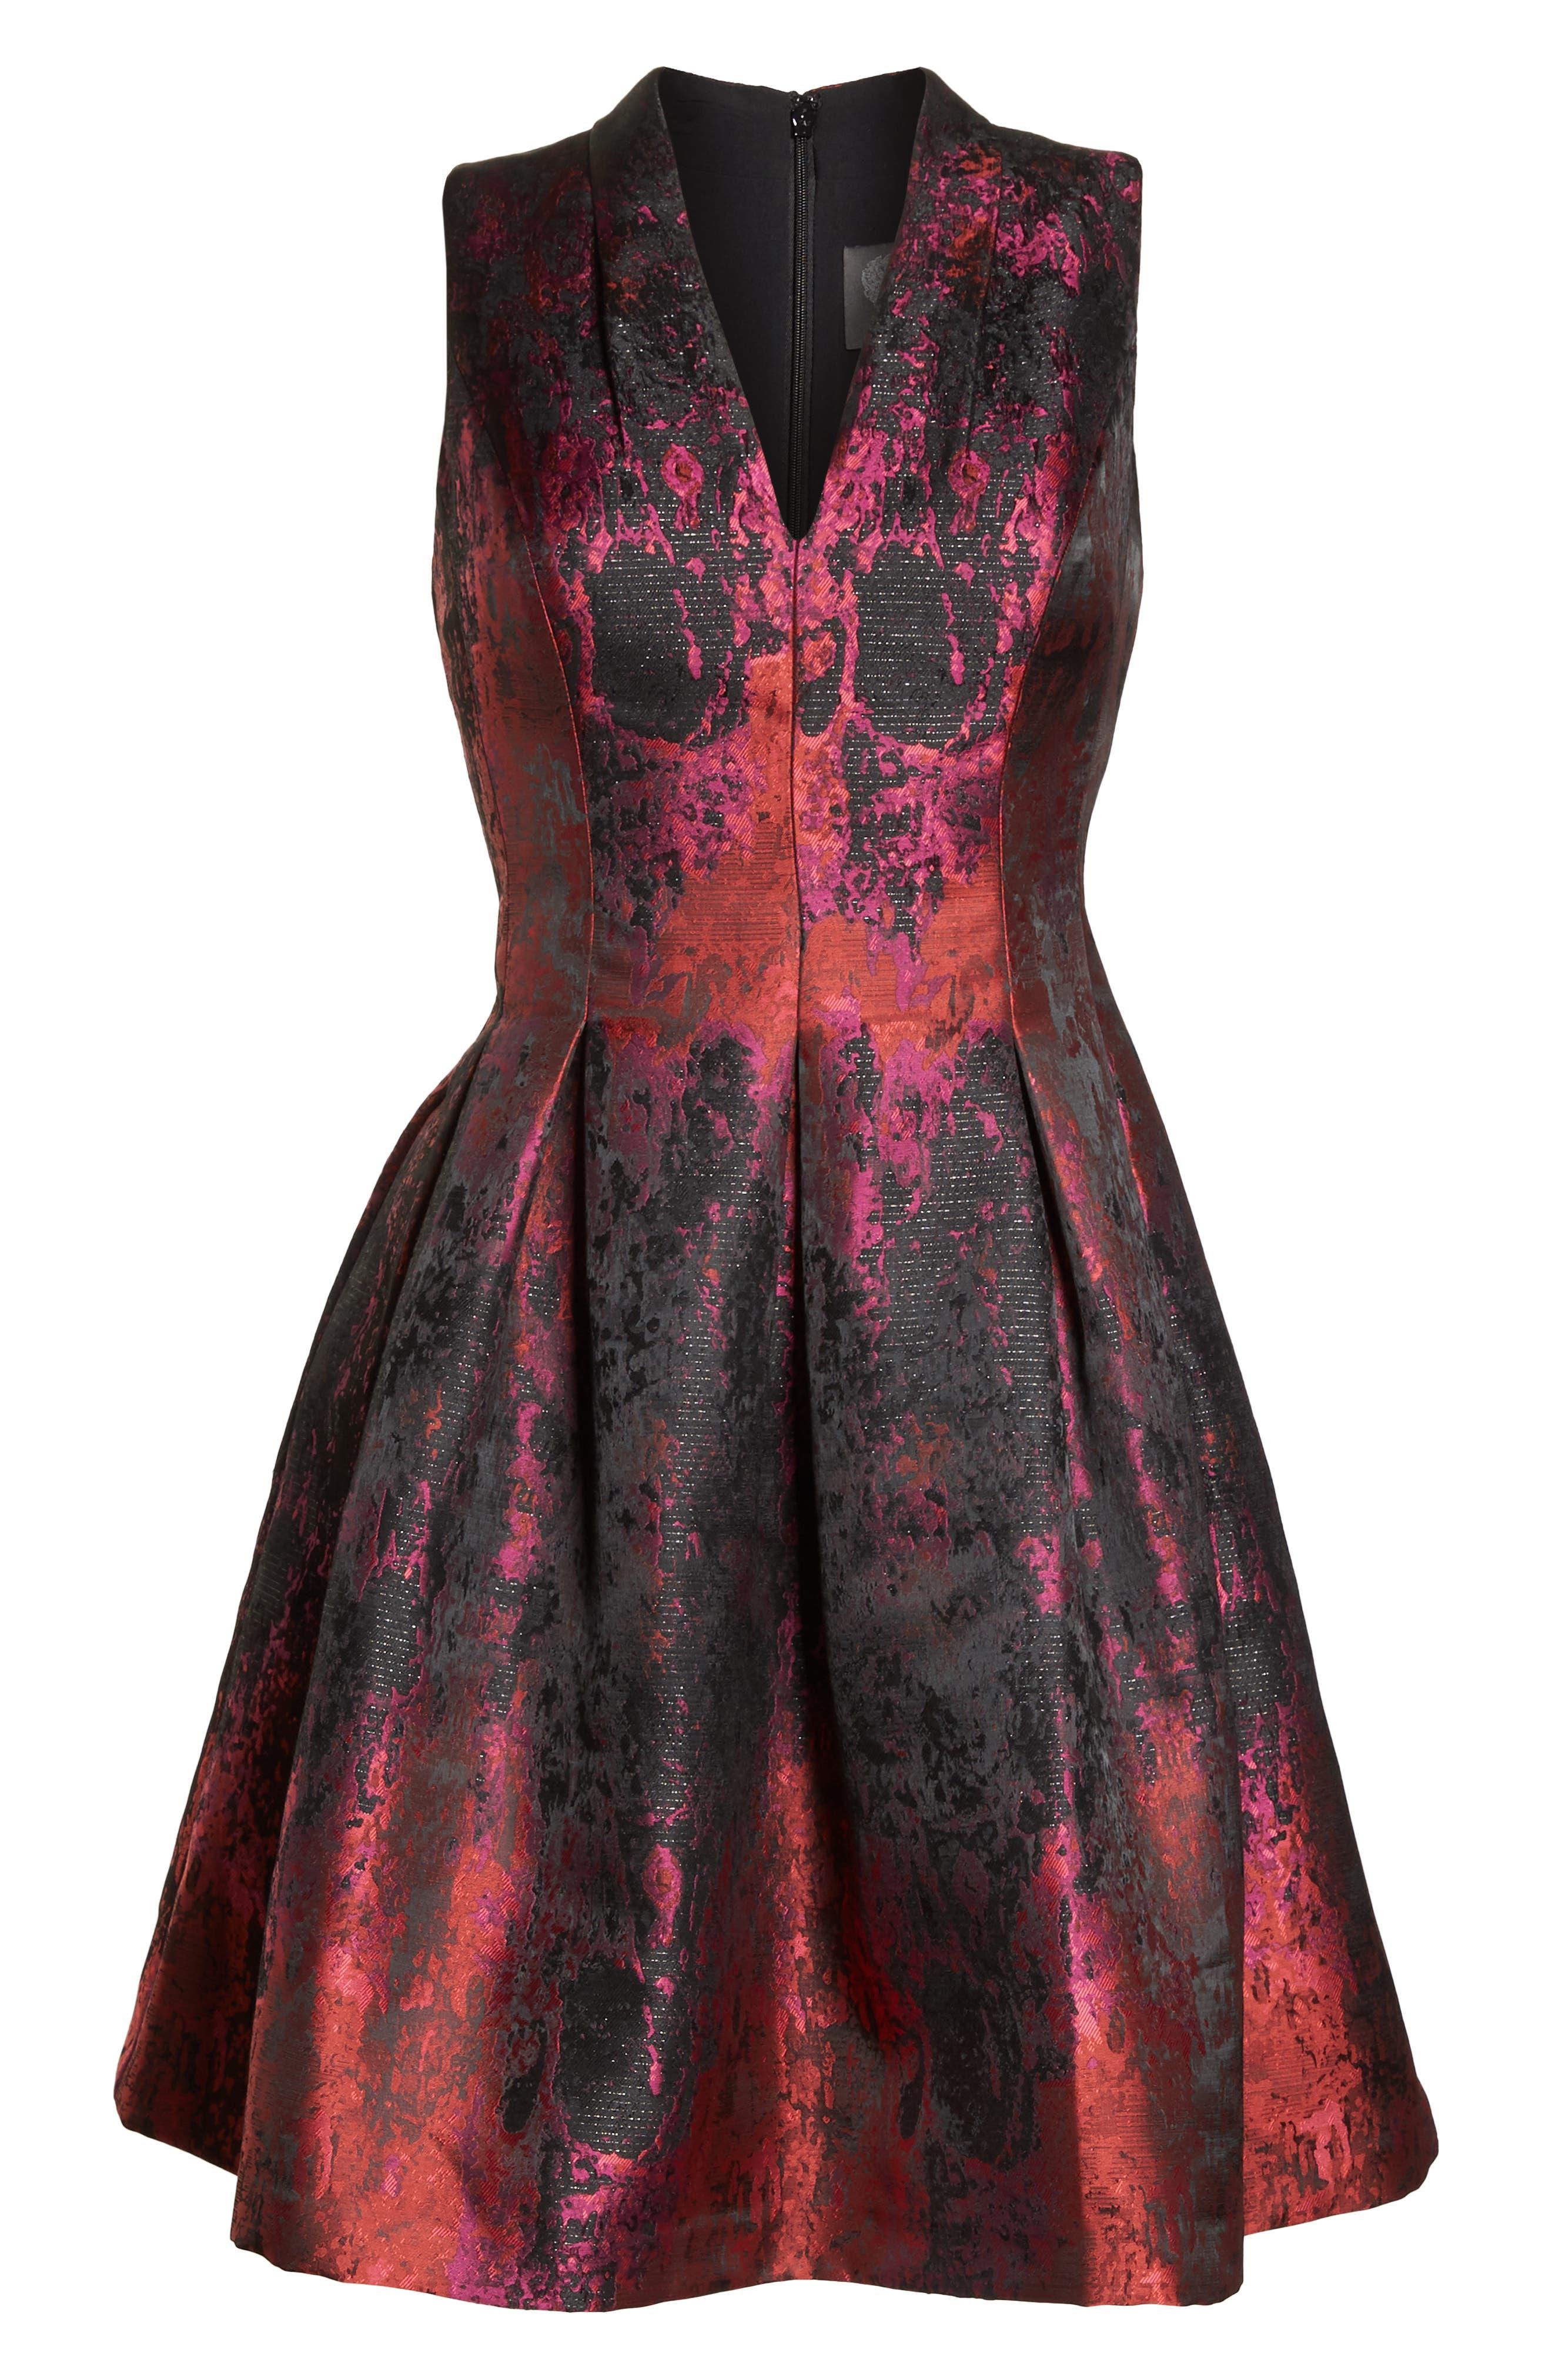 VINCE CAMUTO, Jacquard Fit & Flare Dress, Alternate thumbnail 7, color, 653